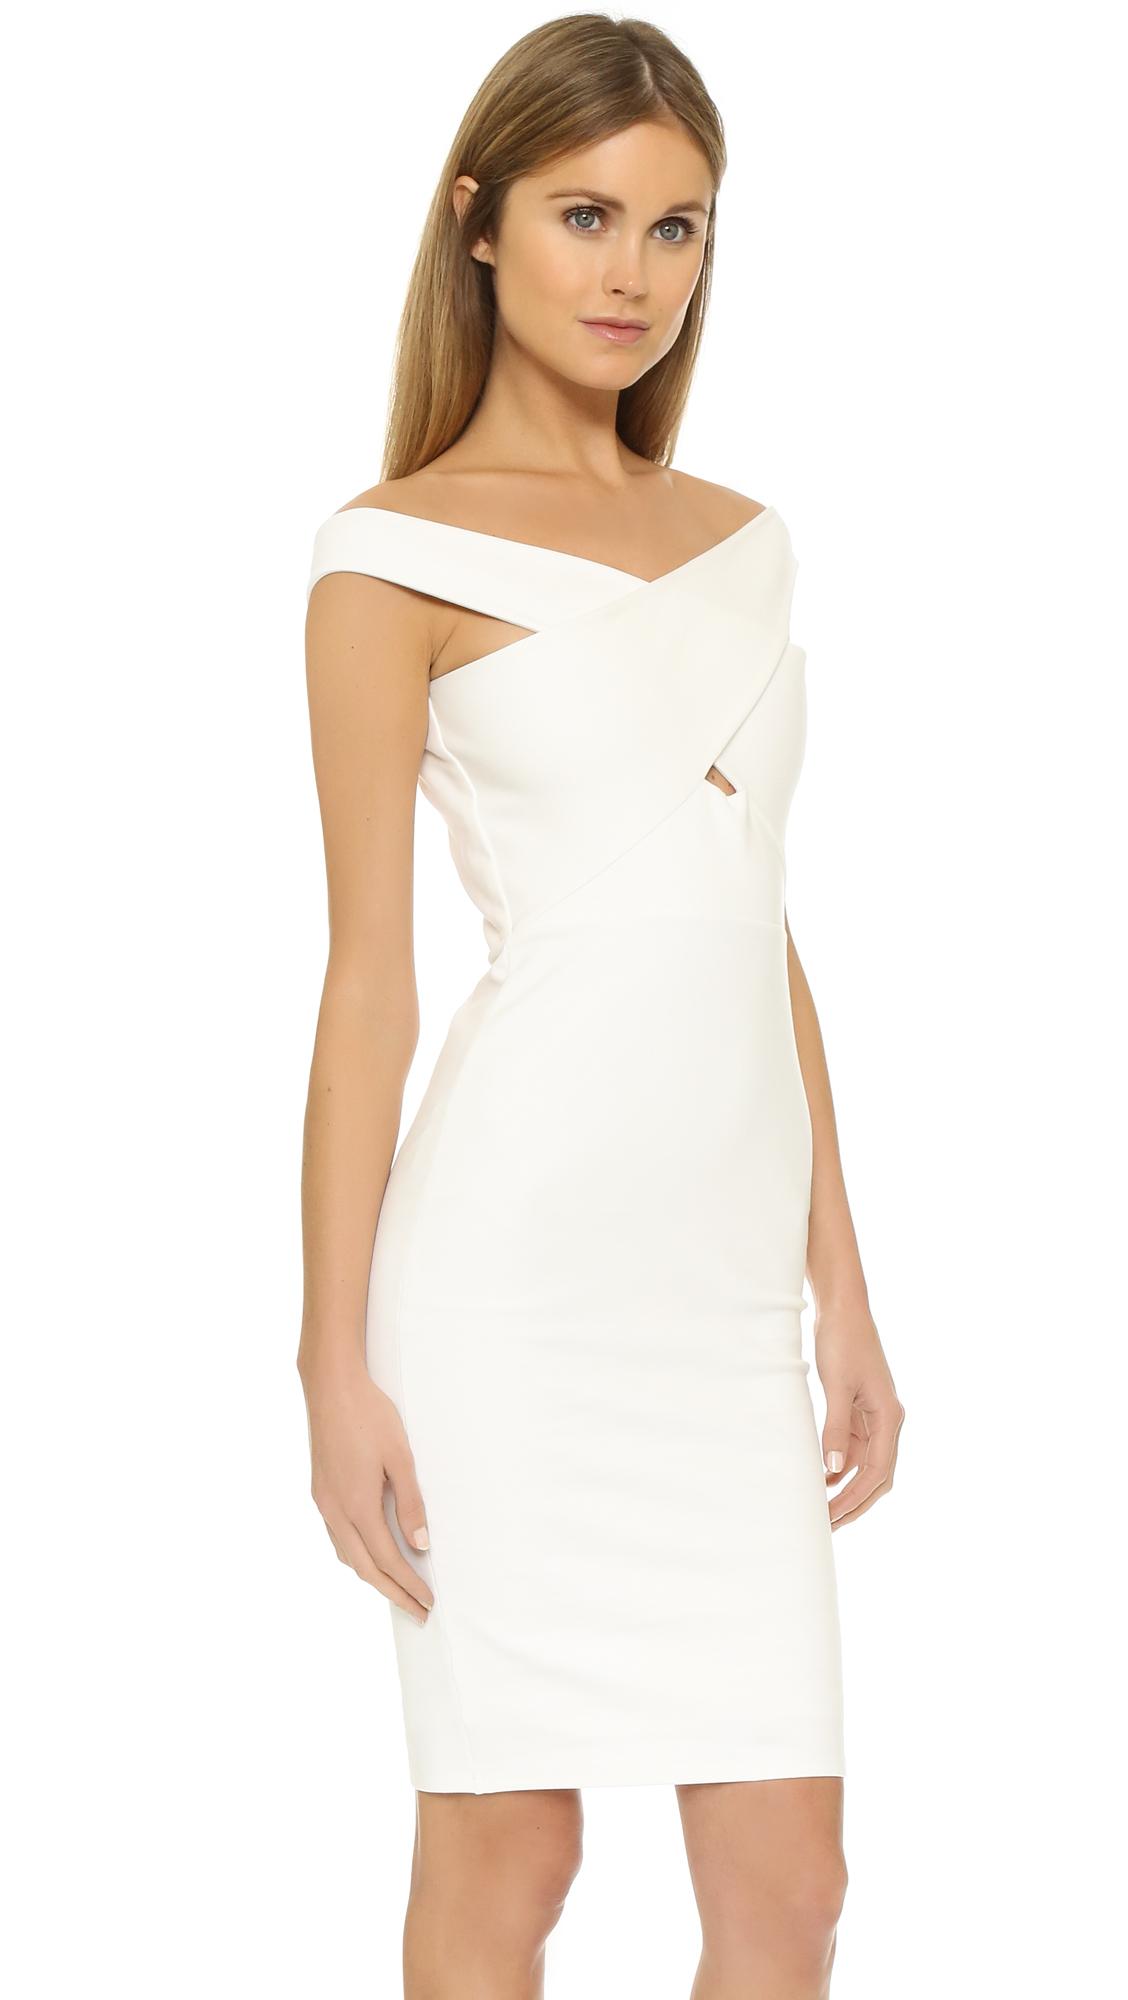 Michelle Mason Woman Stretch-knit Top Ivory Size M Michelle Mason Manchester For Sale QTcMxco